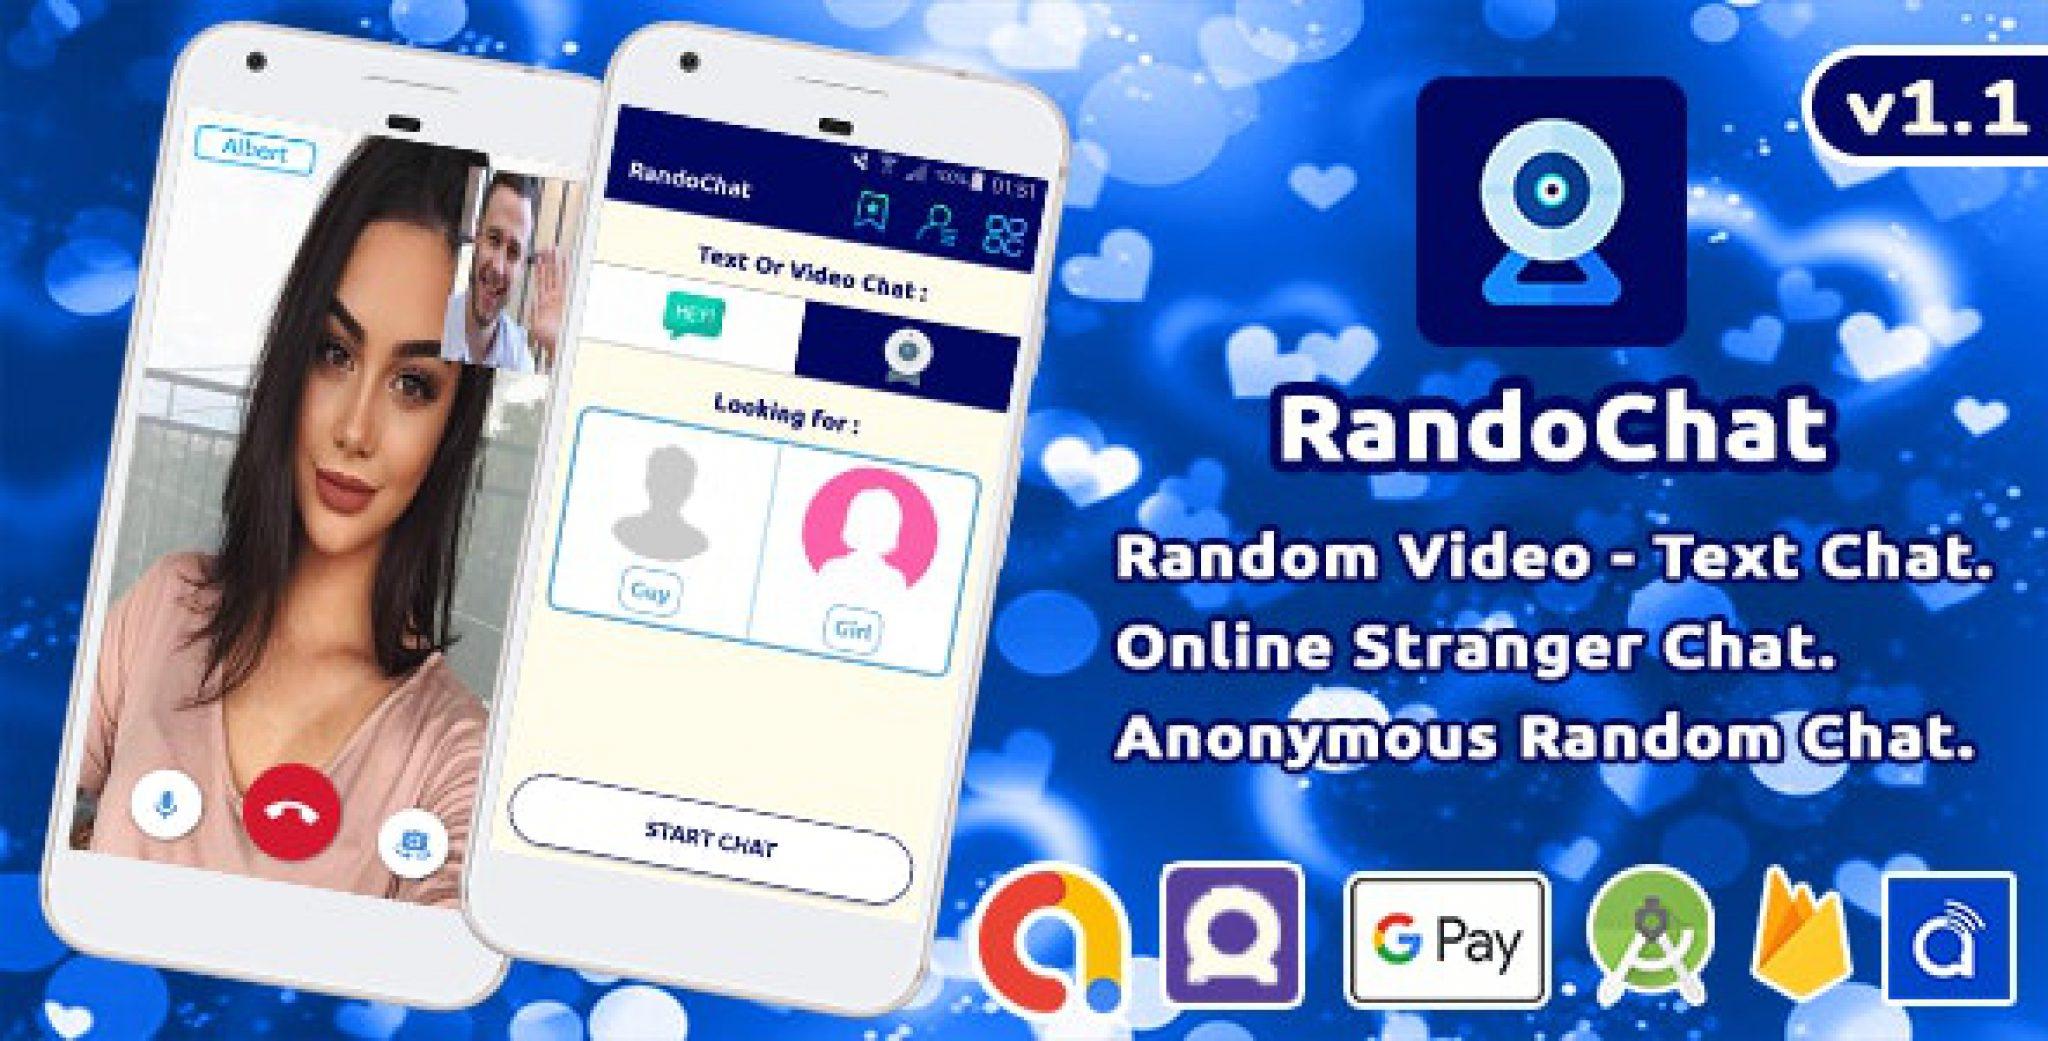 RandoChat - Dating App - Random Video Chat with Online